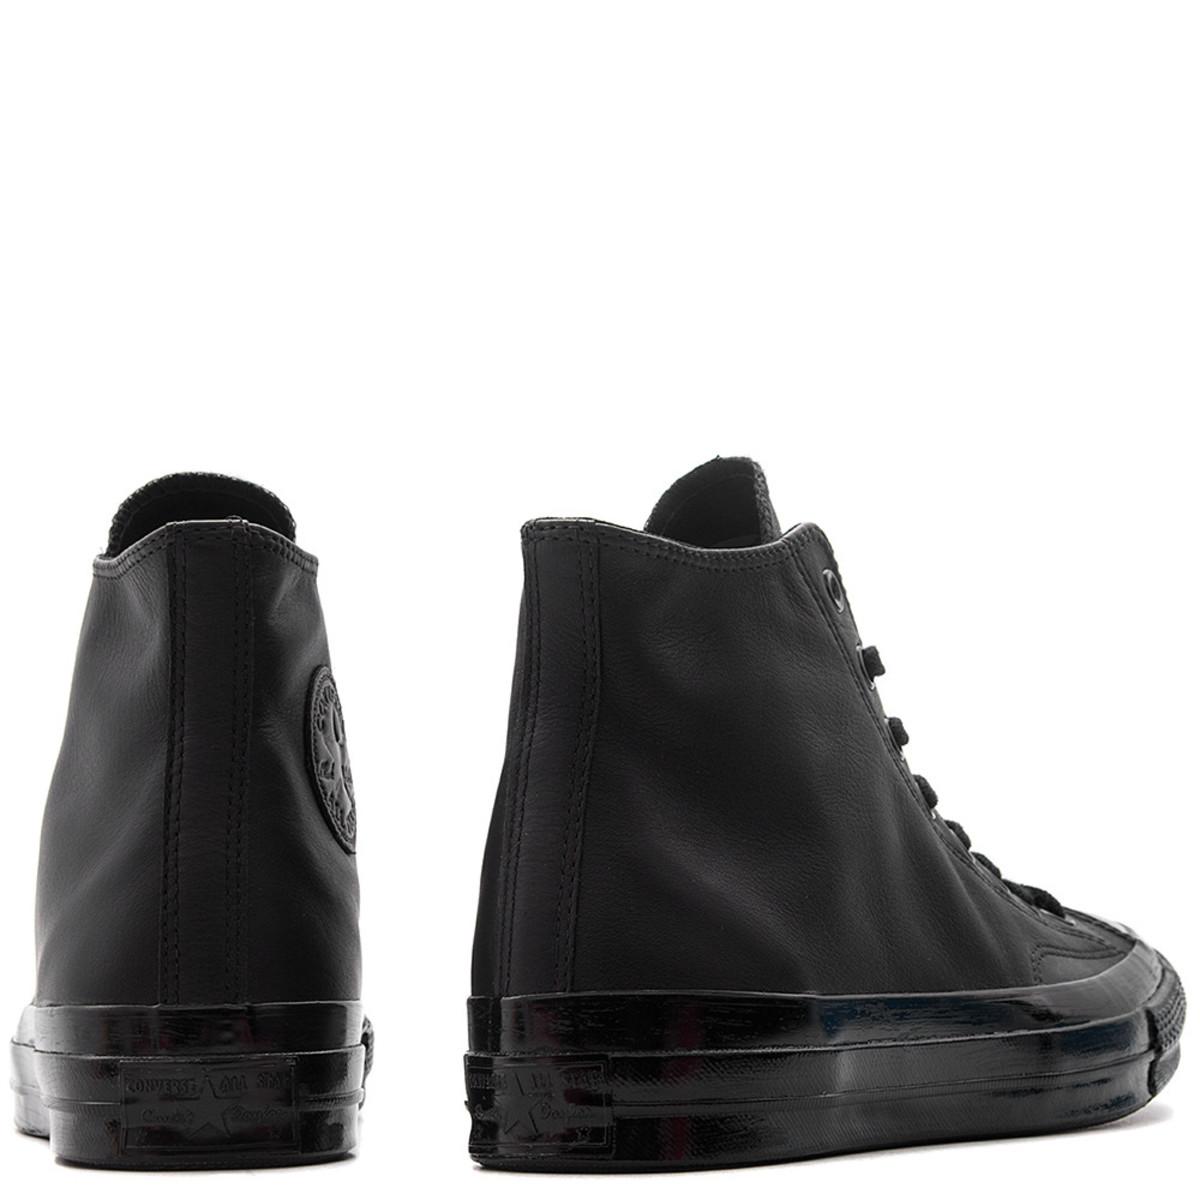 8ab3441e247 Converse Chuck Taylor All Star 70 Mono Leather Hi - Black